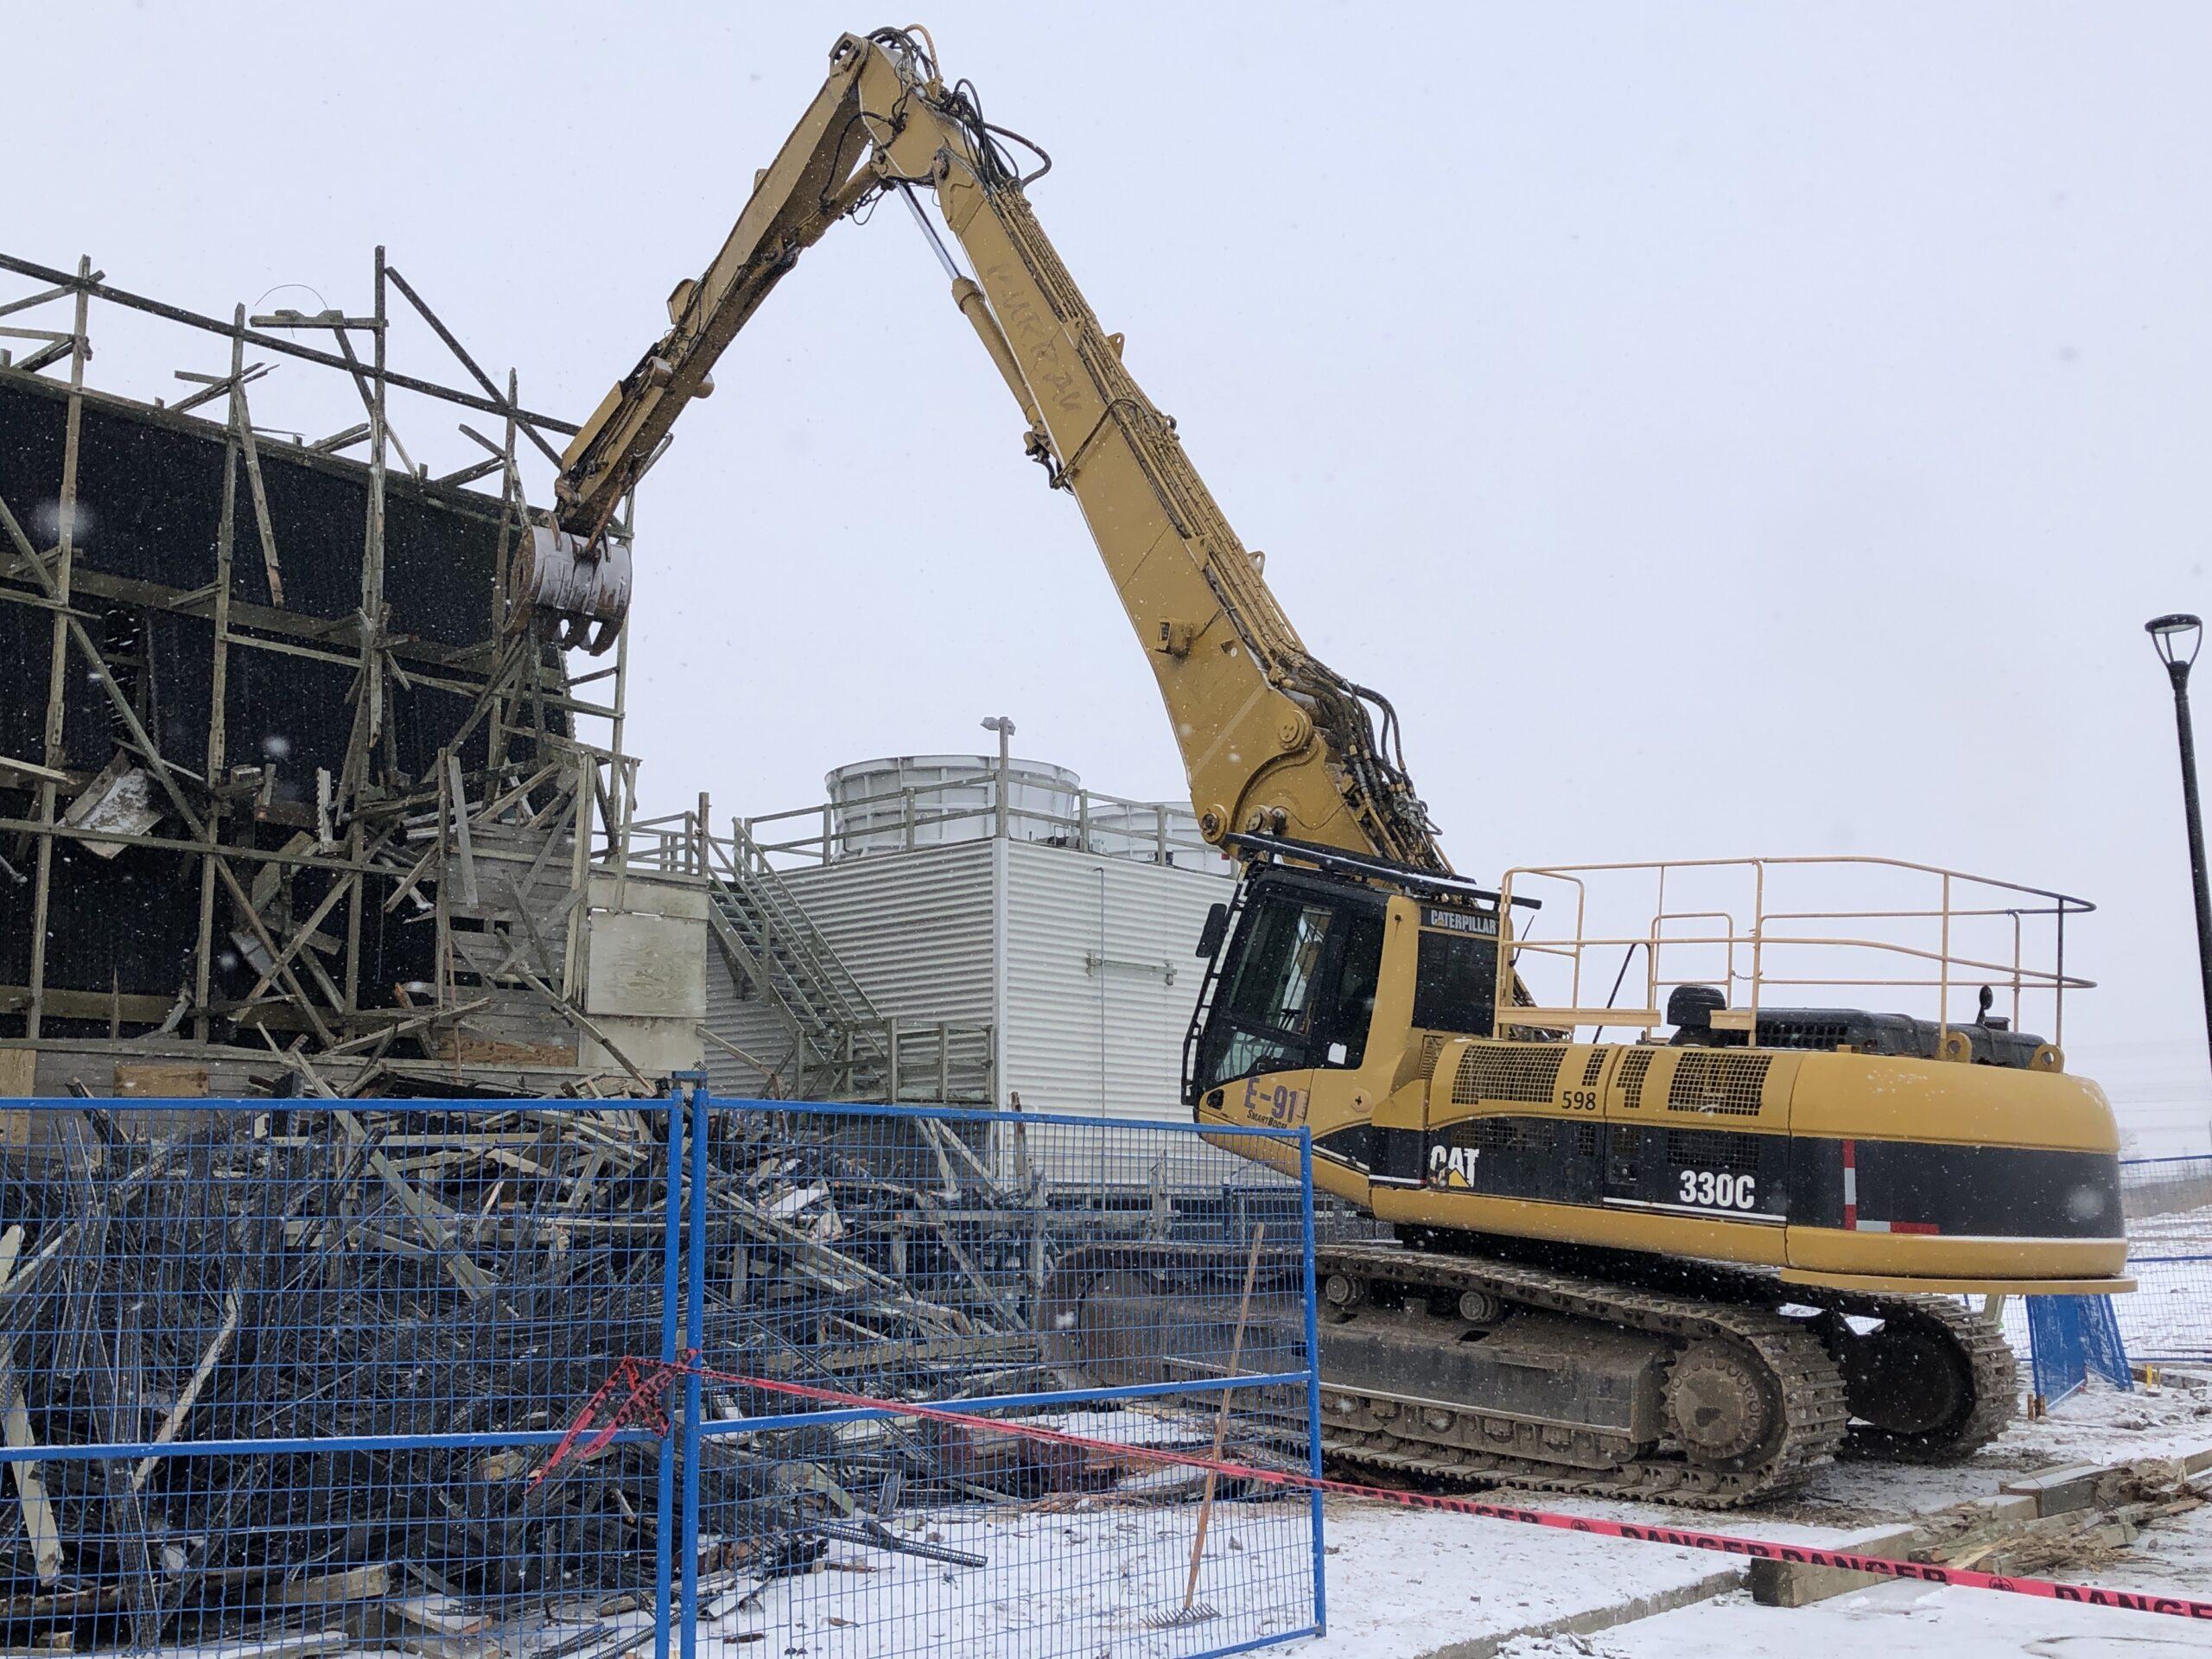 Excavator demolishing the cooling tower